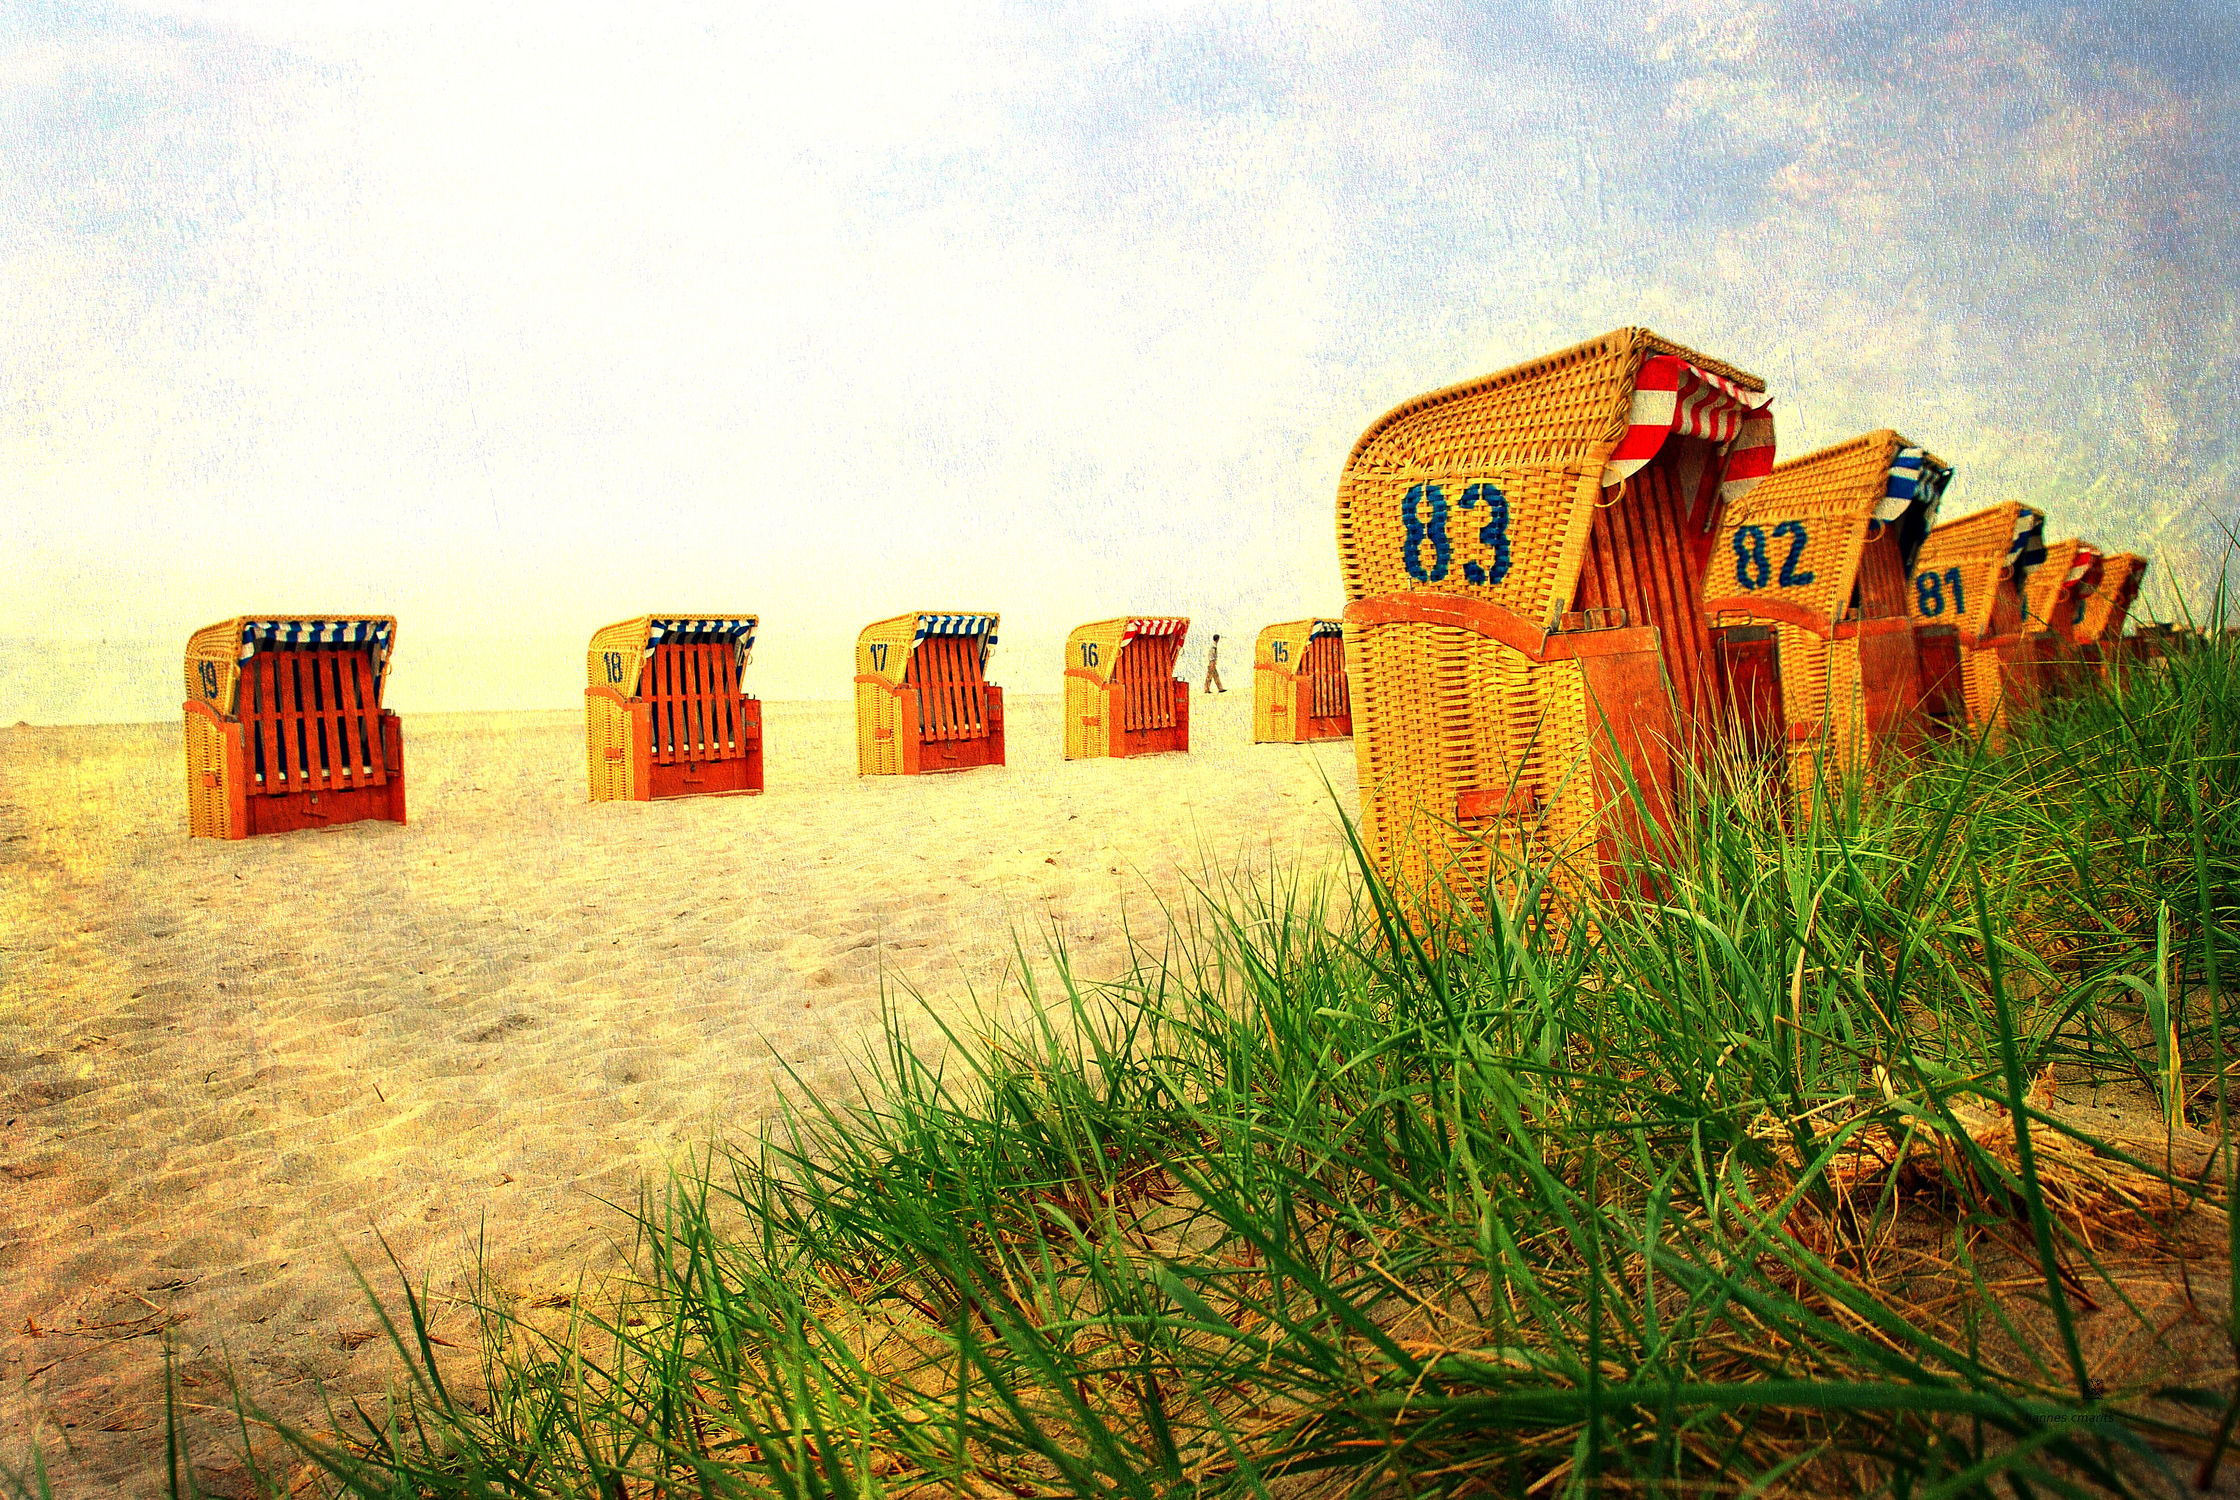 Bild mit Strand, Sandstrand, Strandkörbe, Ostsee, Meer, Strandkorb, Düne, Dünen, Textur, Strandhafer, Strandgras